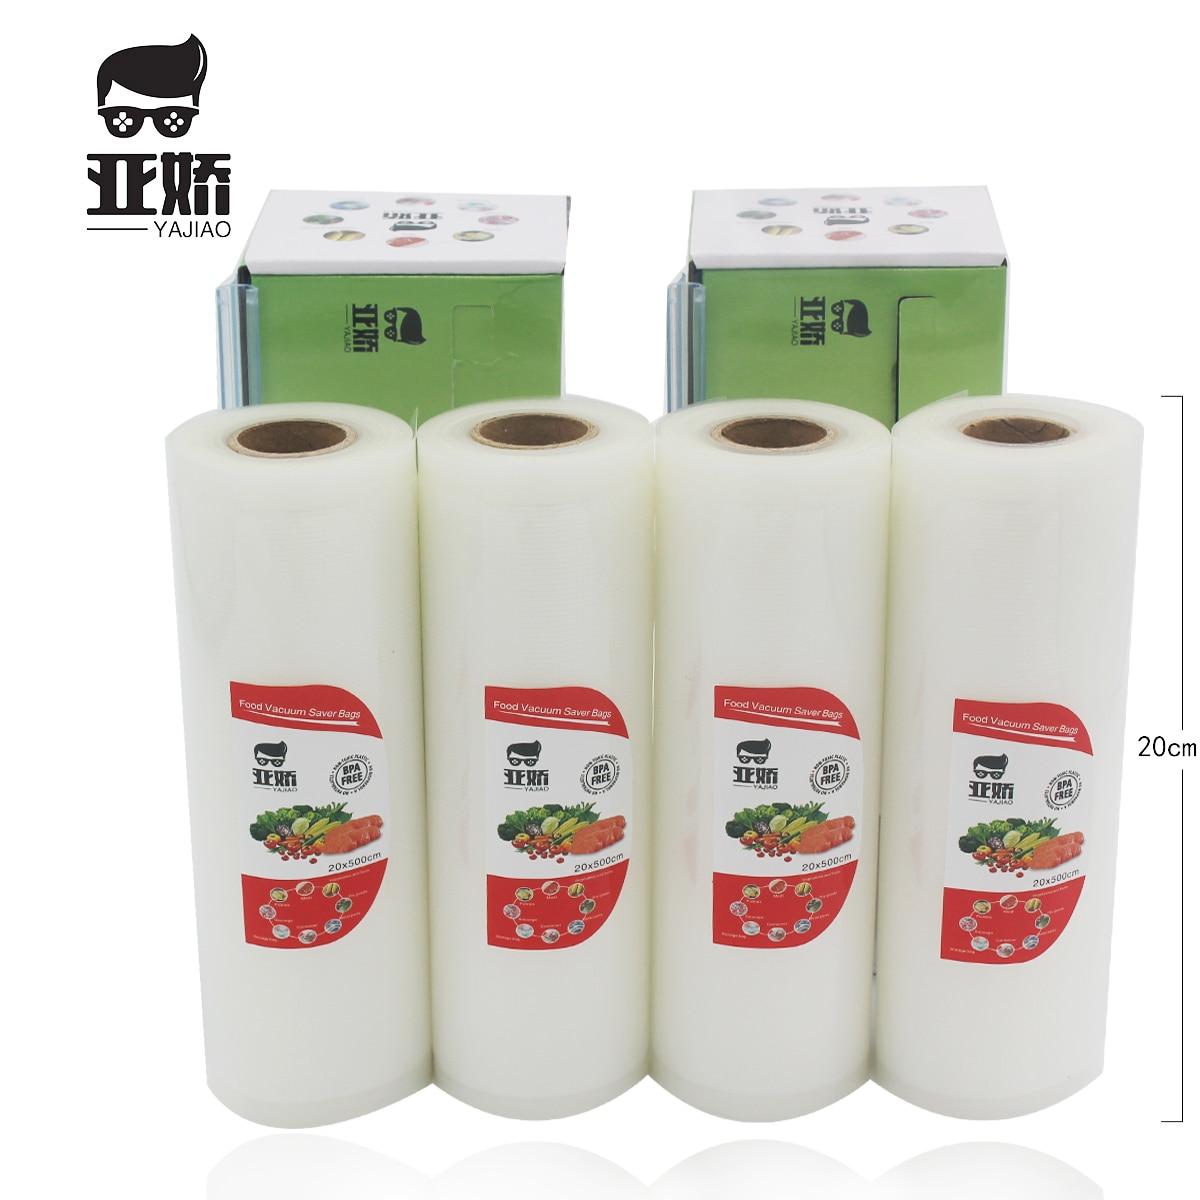 YAJIAO Food Vacuum Sealer Bag 20cm*500cm With Cutting Knife Box For Vacuum Sealer Food Fresh Kitchen Long Keeping Storage Bag